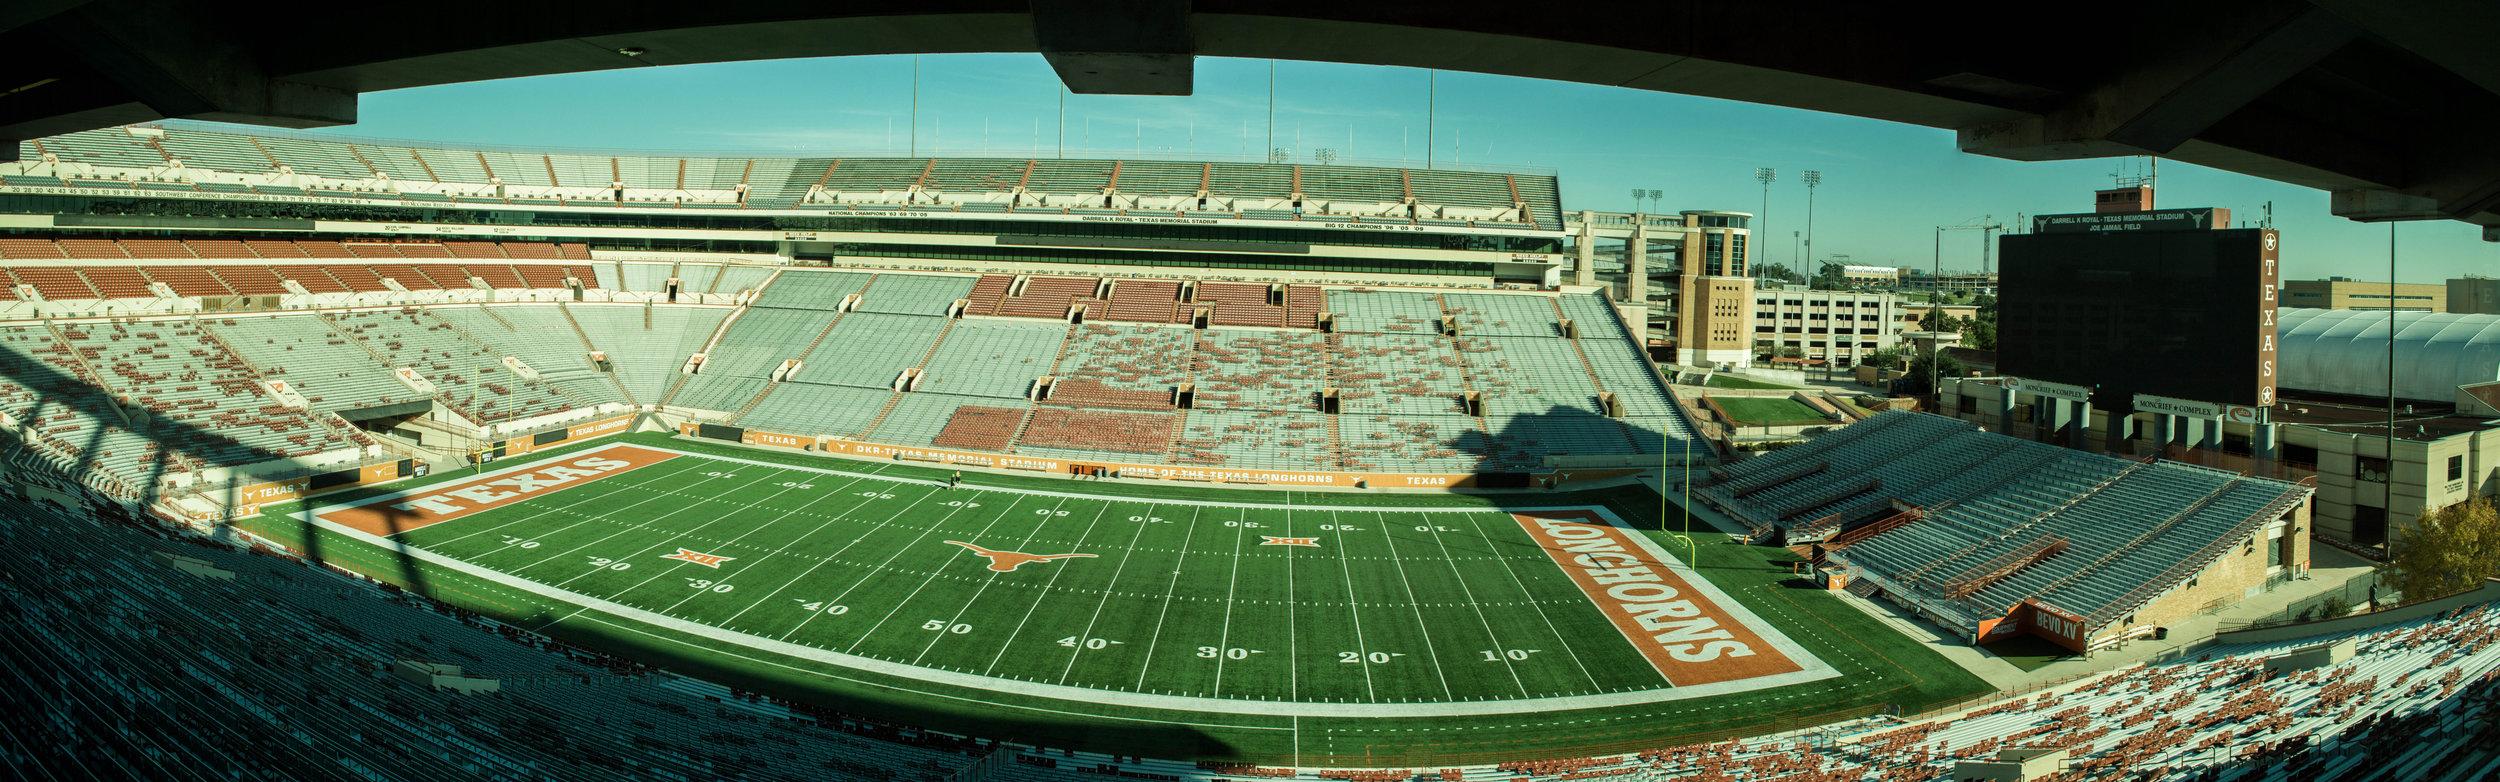 Darrell K Royal- Texas Memorial Stadium